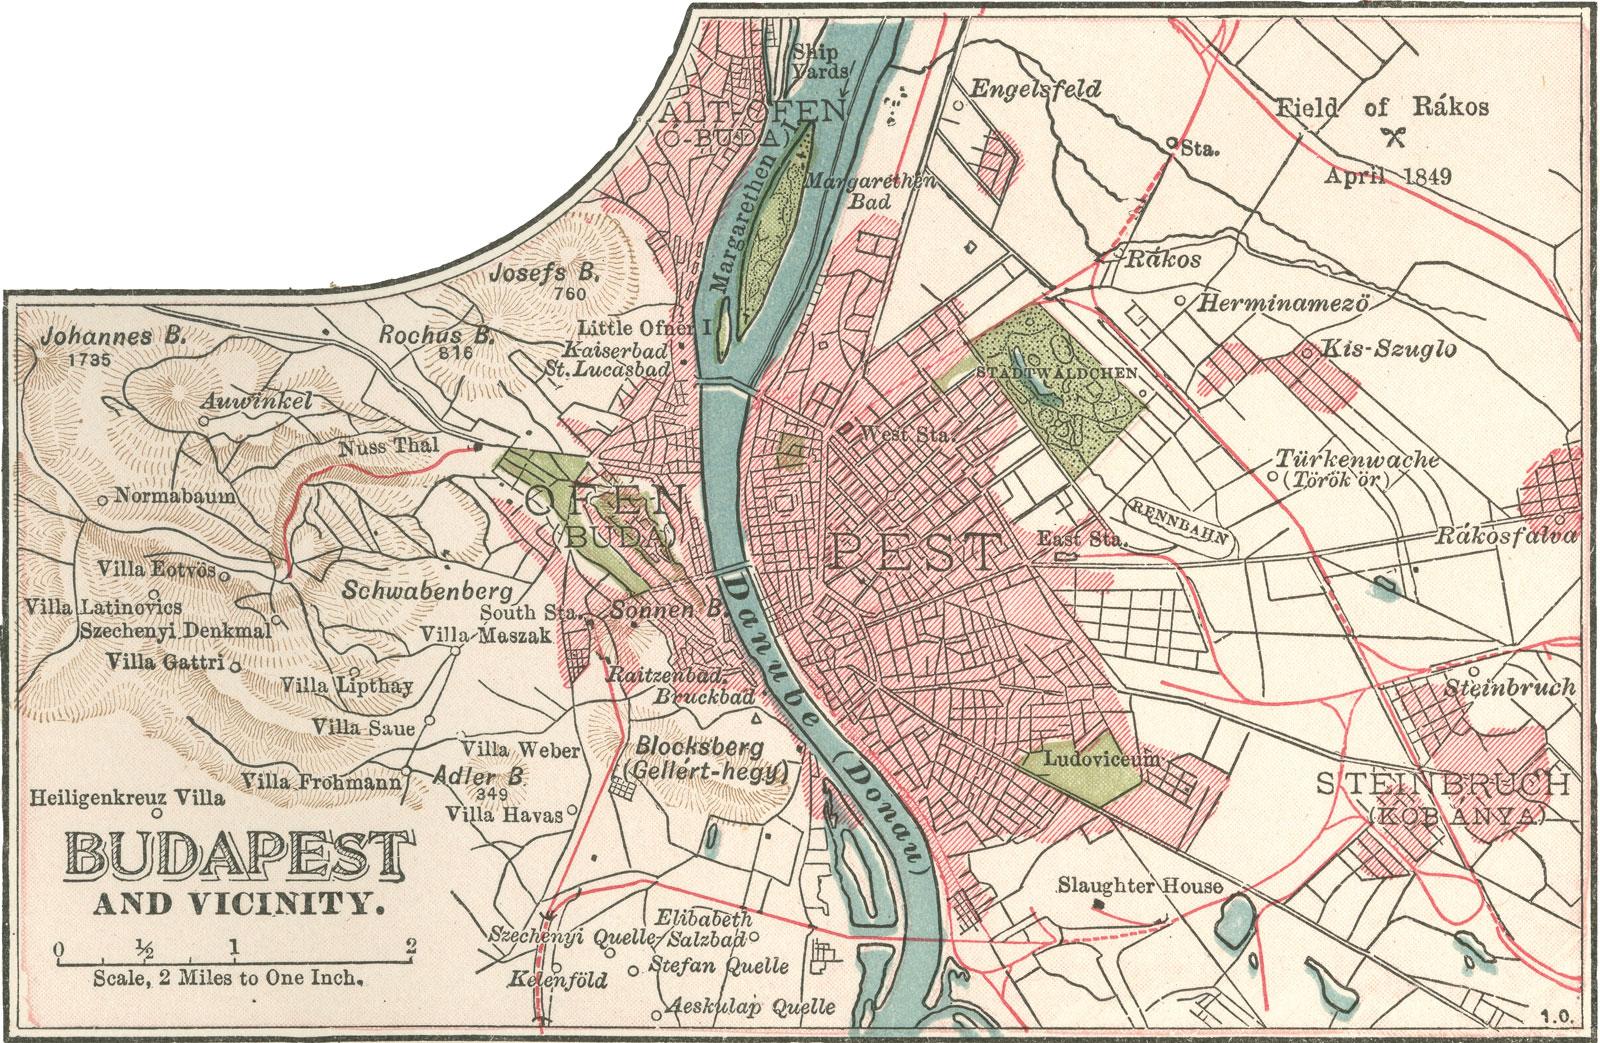 budapest térkép 1940 Old Budapest/Budapest régen: Budapest 1900   Map budapest térkép 1940